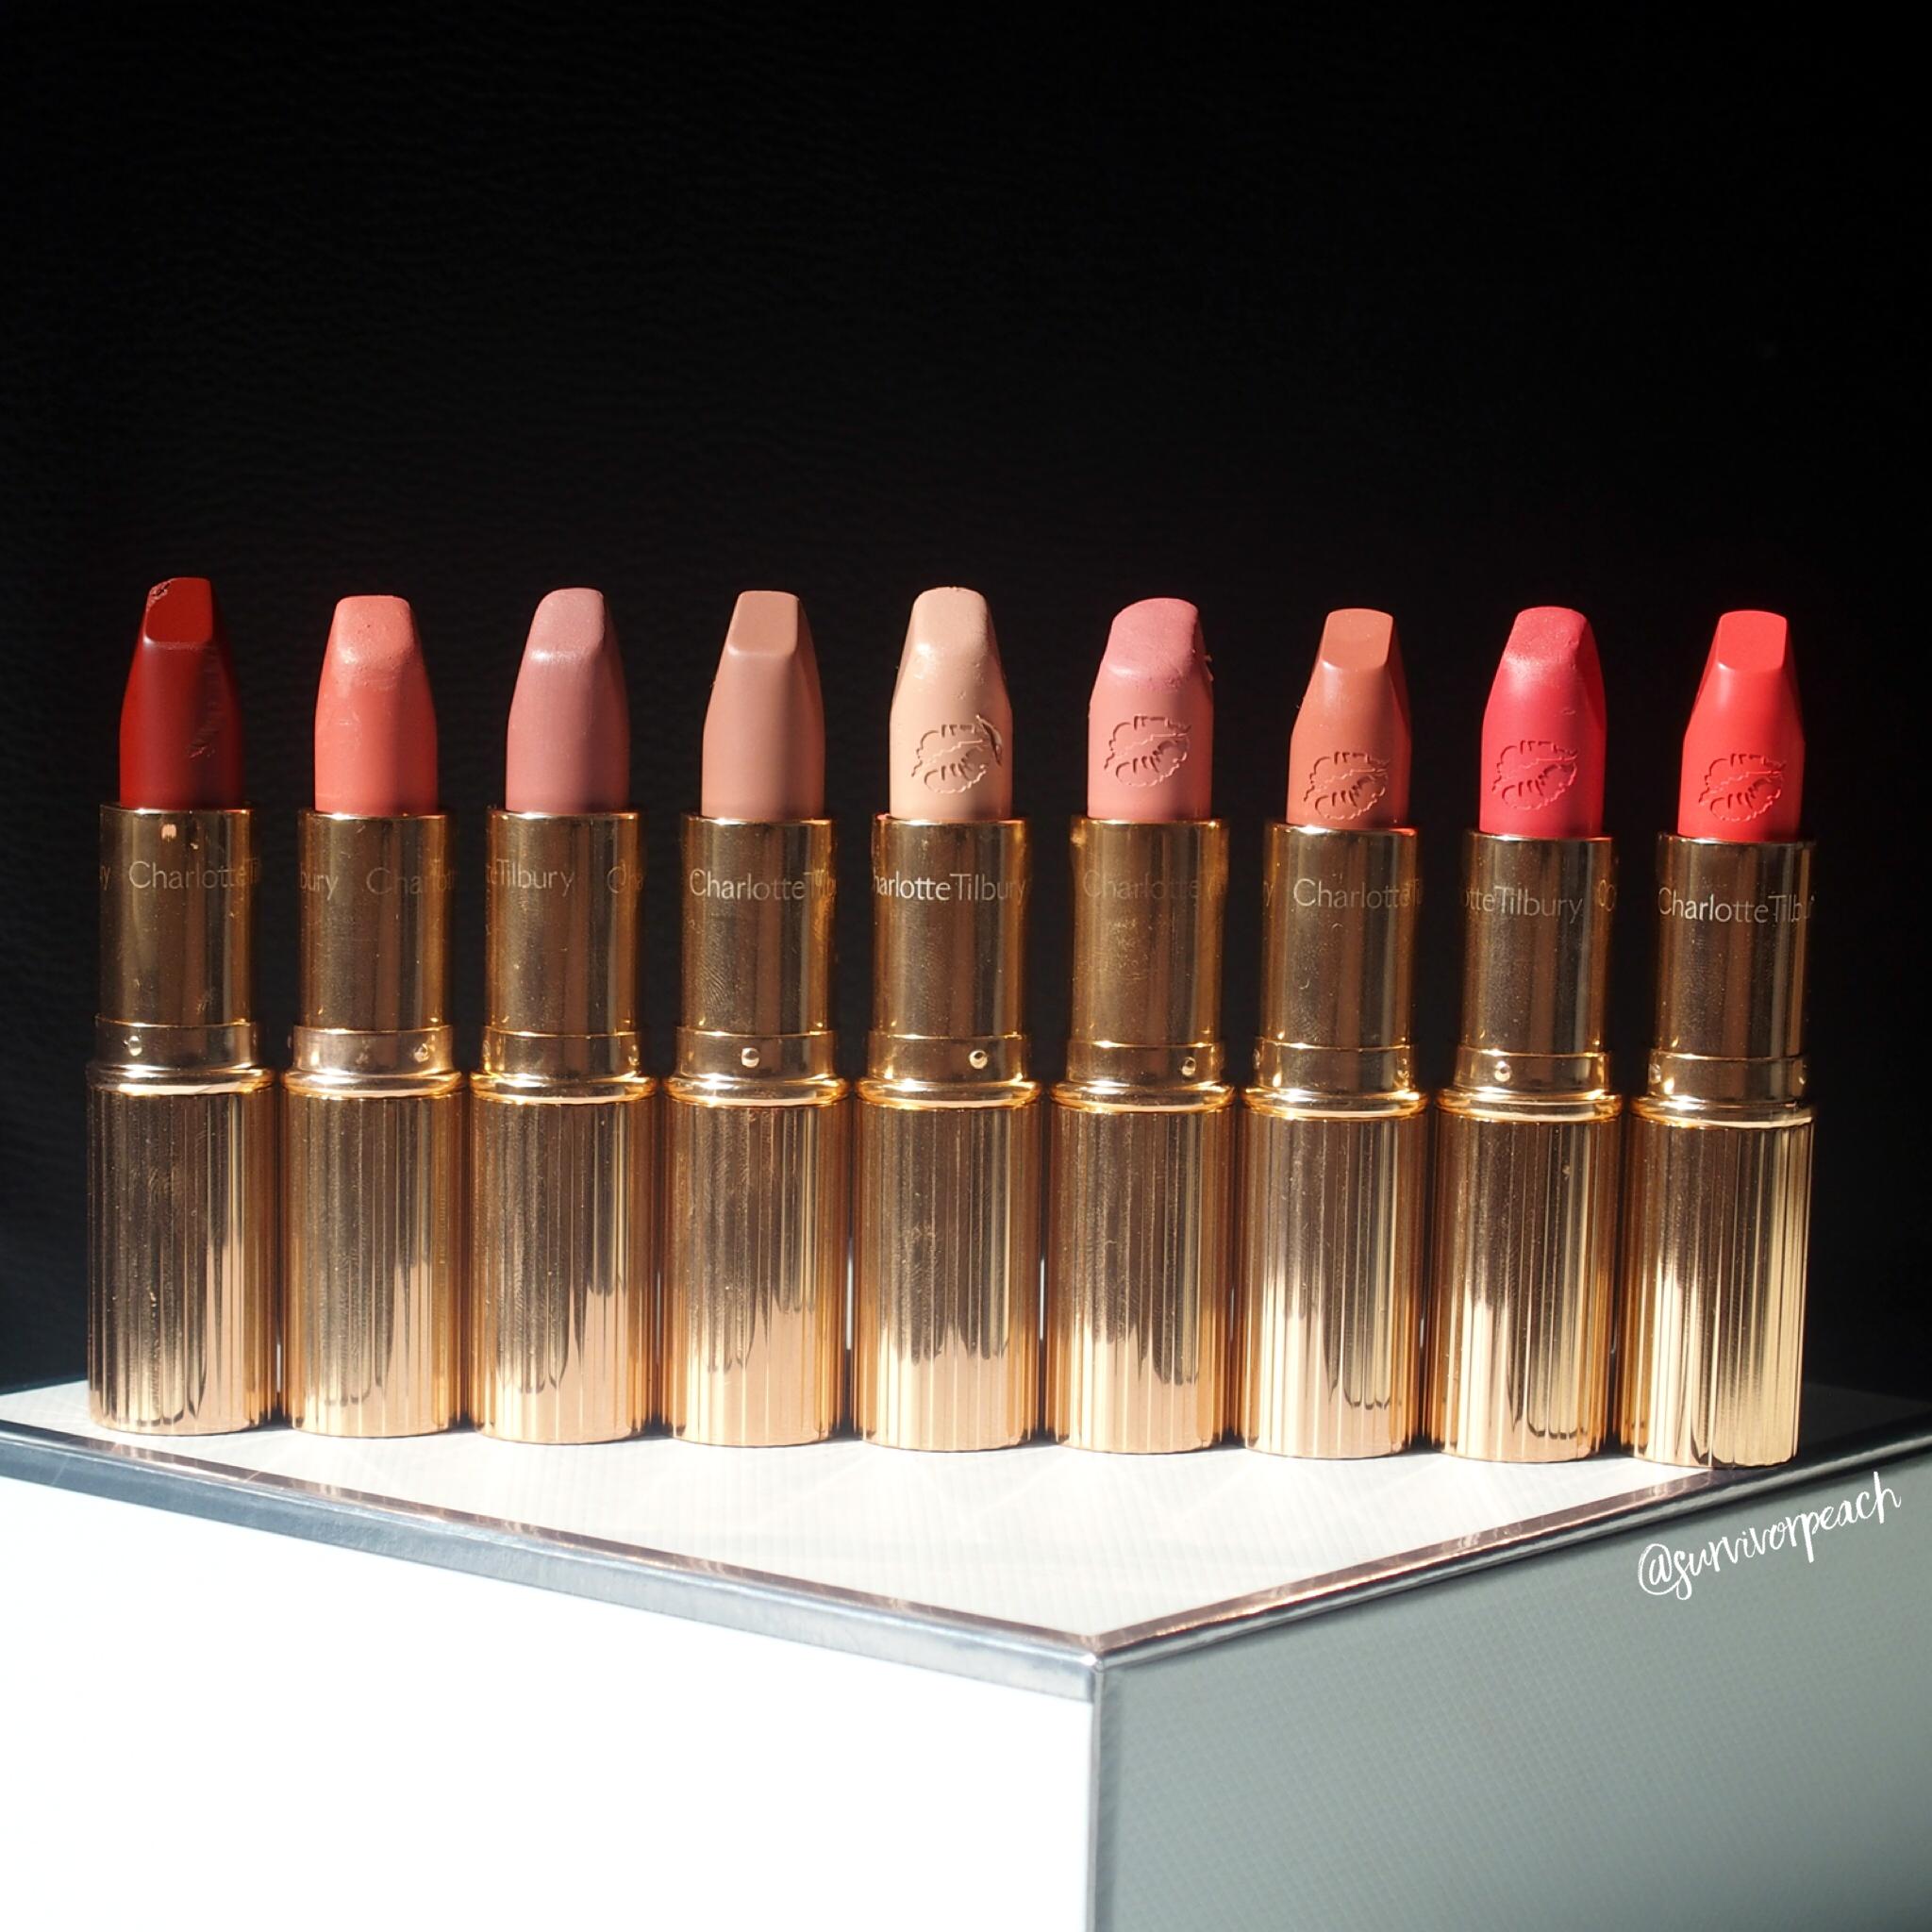 Charlotte Tilbury Matte Revolution Lipsticks + Hot Lips